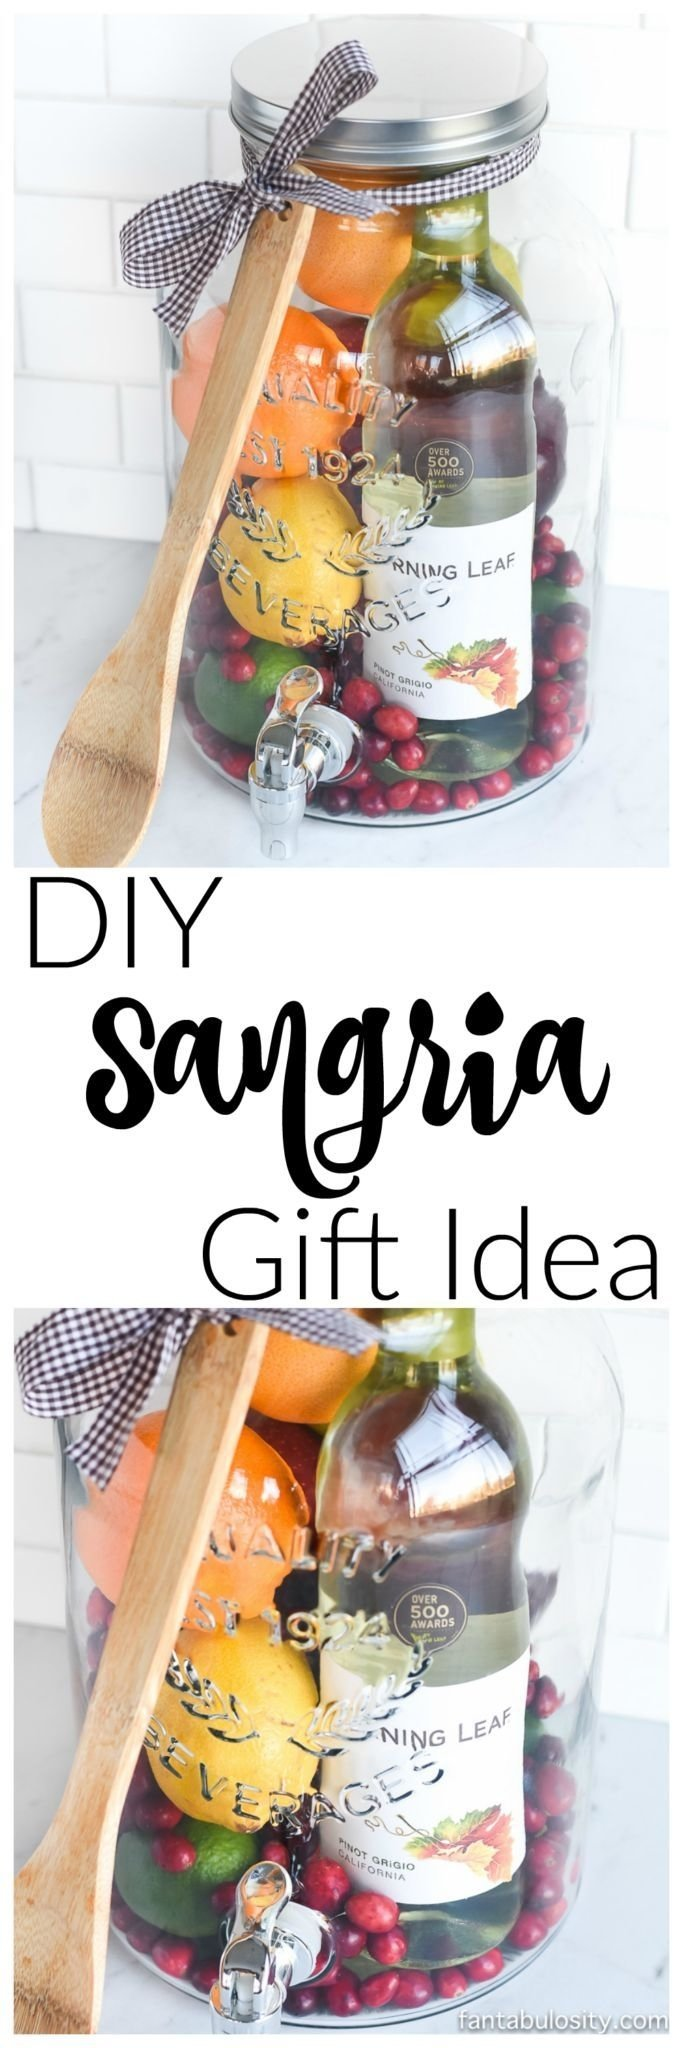 10 Elegant Creative Gift Ideas For Women 60 best friendship gifts images on pinterest friendship gifts 2020